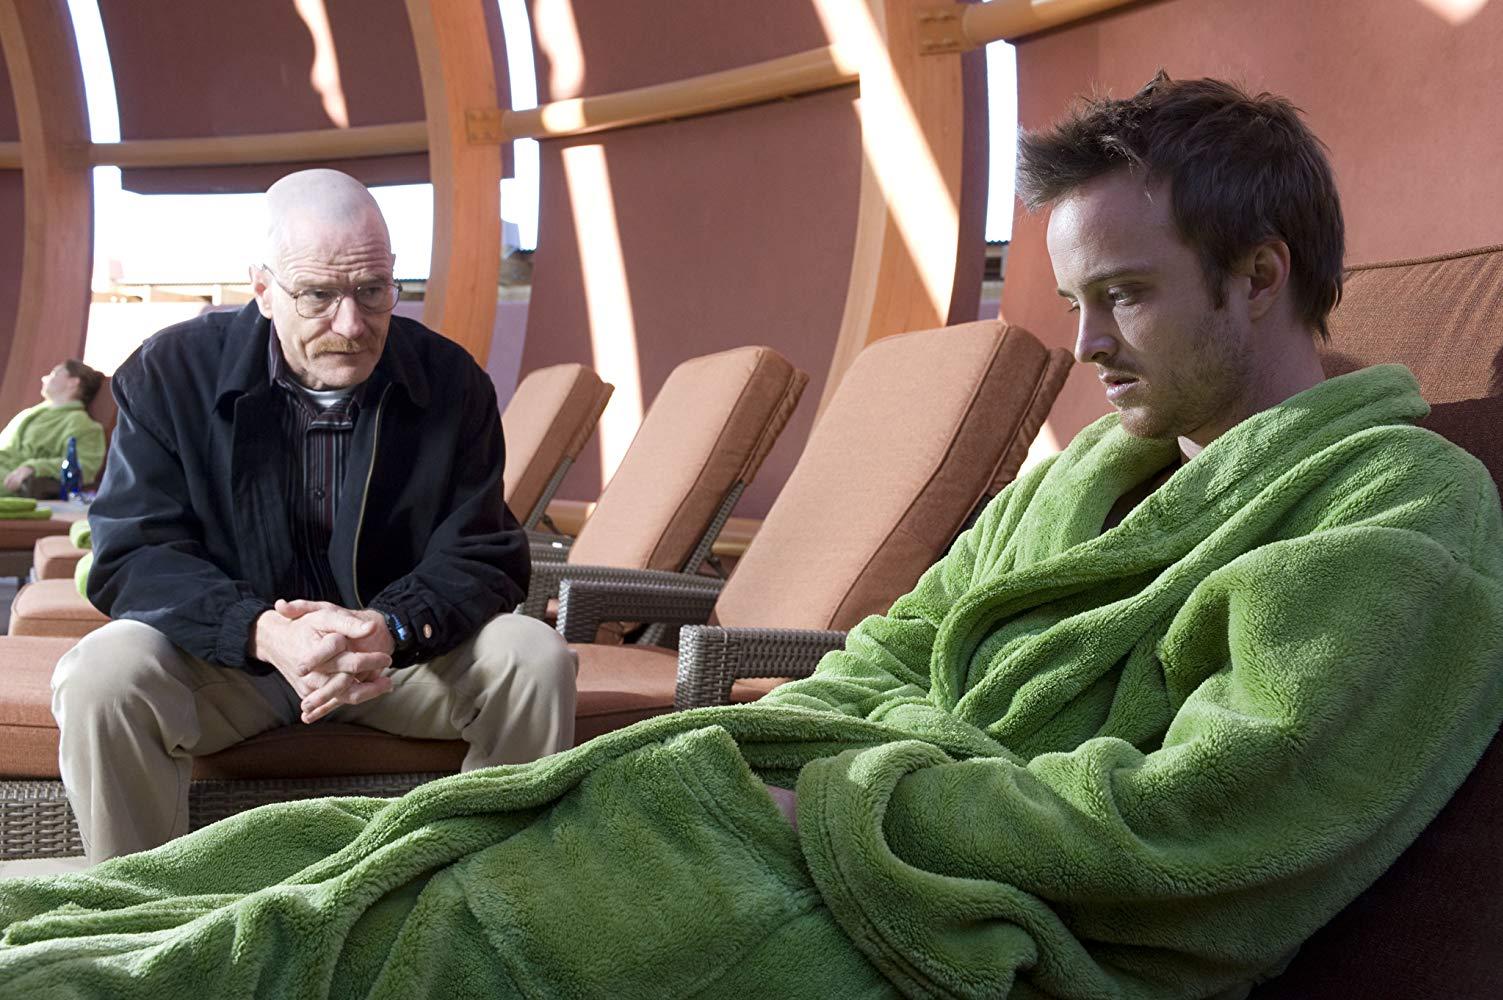 Walter White (Bryan Cranston) and Jesse Pinkman (Aaron Paul) in  Breaking Bad.